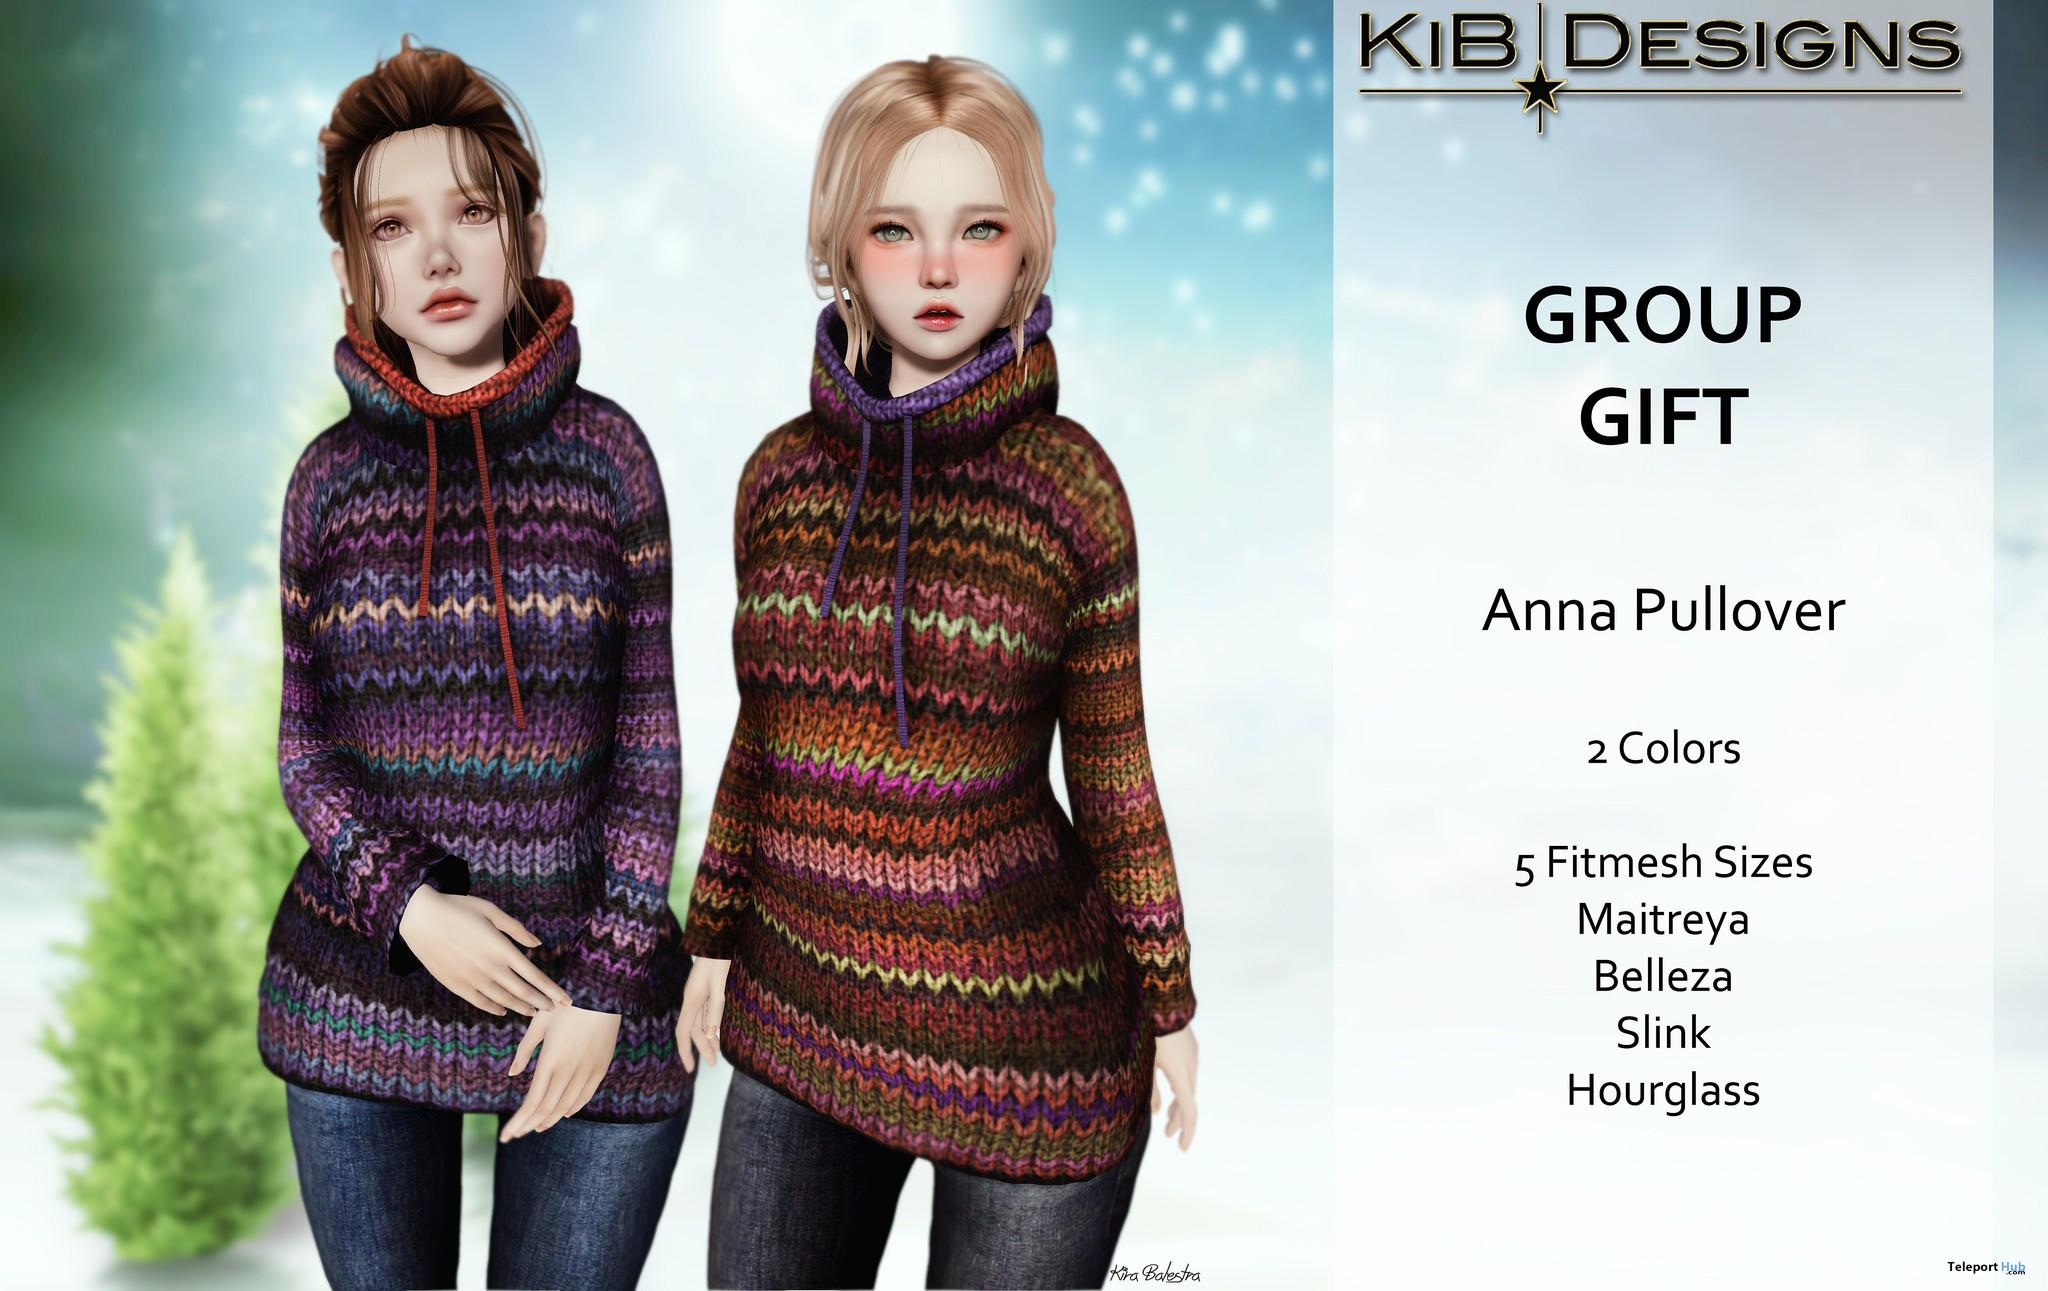 Anna Pullover December 2016 Group Gift by KiB Designs - Teleport Hub - teleporthub.com